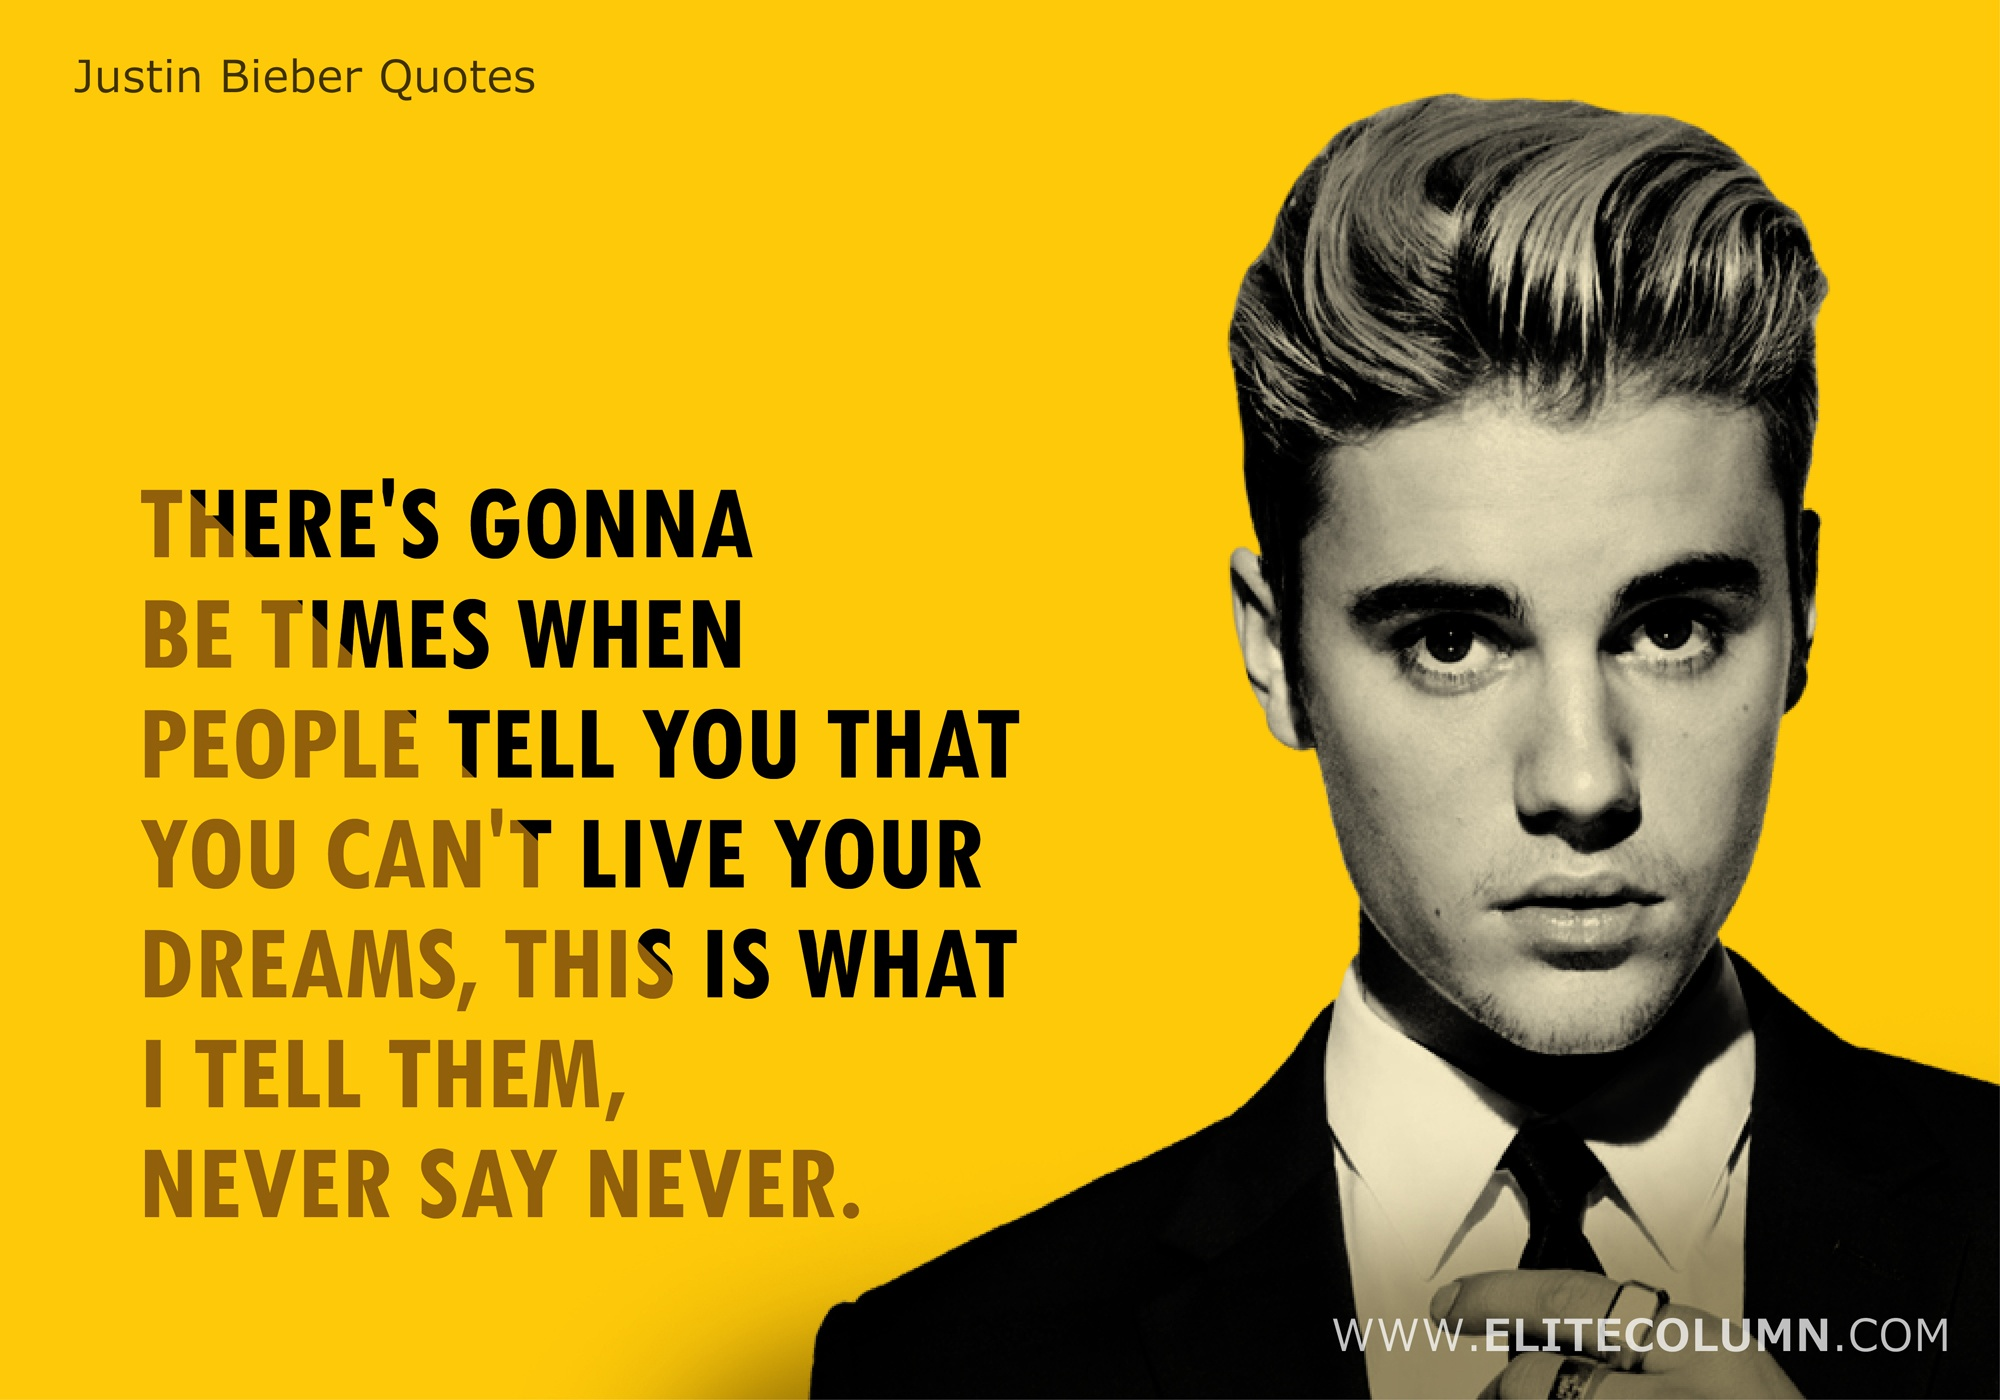 Justin Bieber Quotes (6)